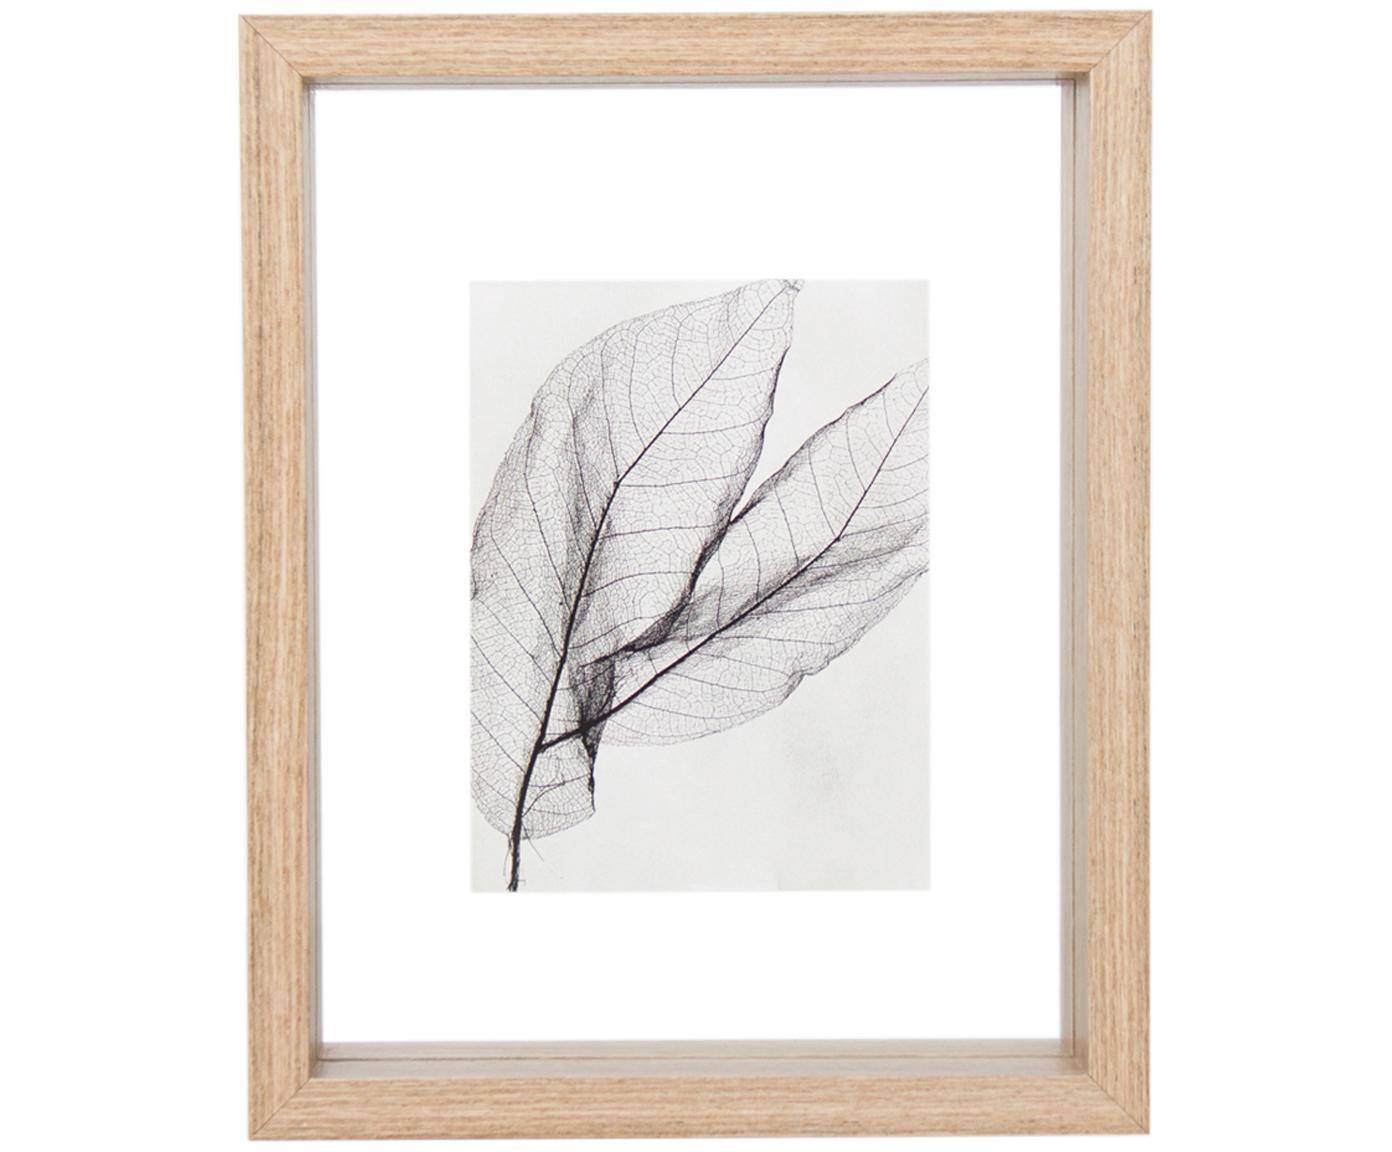 Bilderrahmen Look, Rahmen: Holz, Schwarz, Transparent, 15 x 20 cm